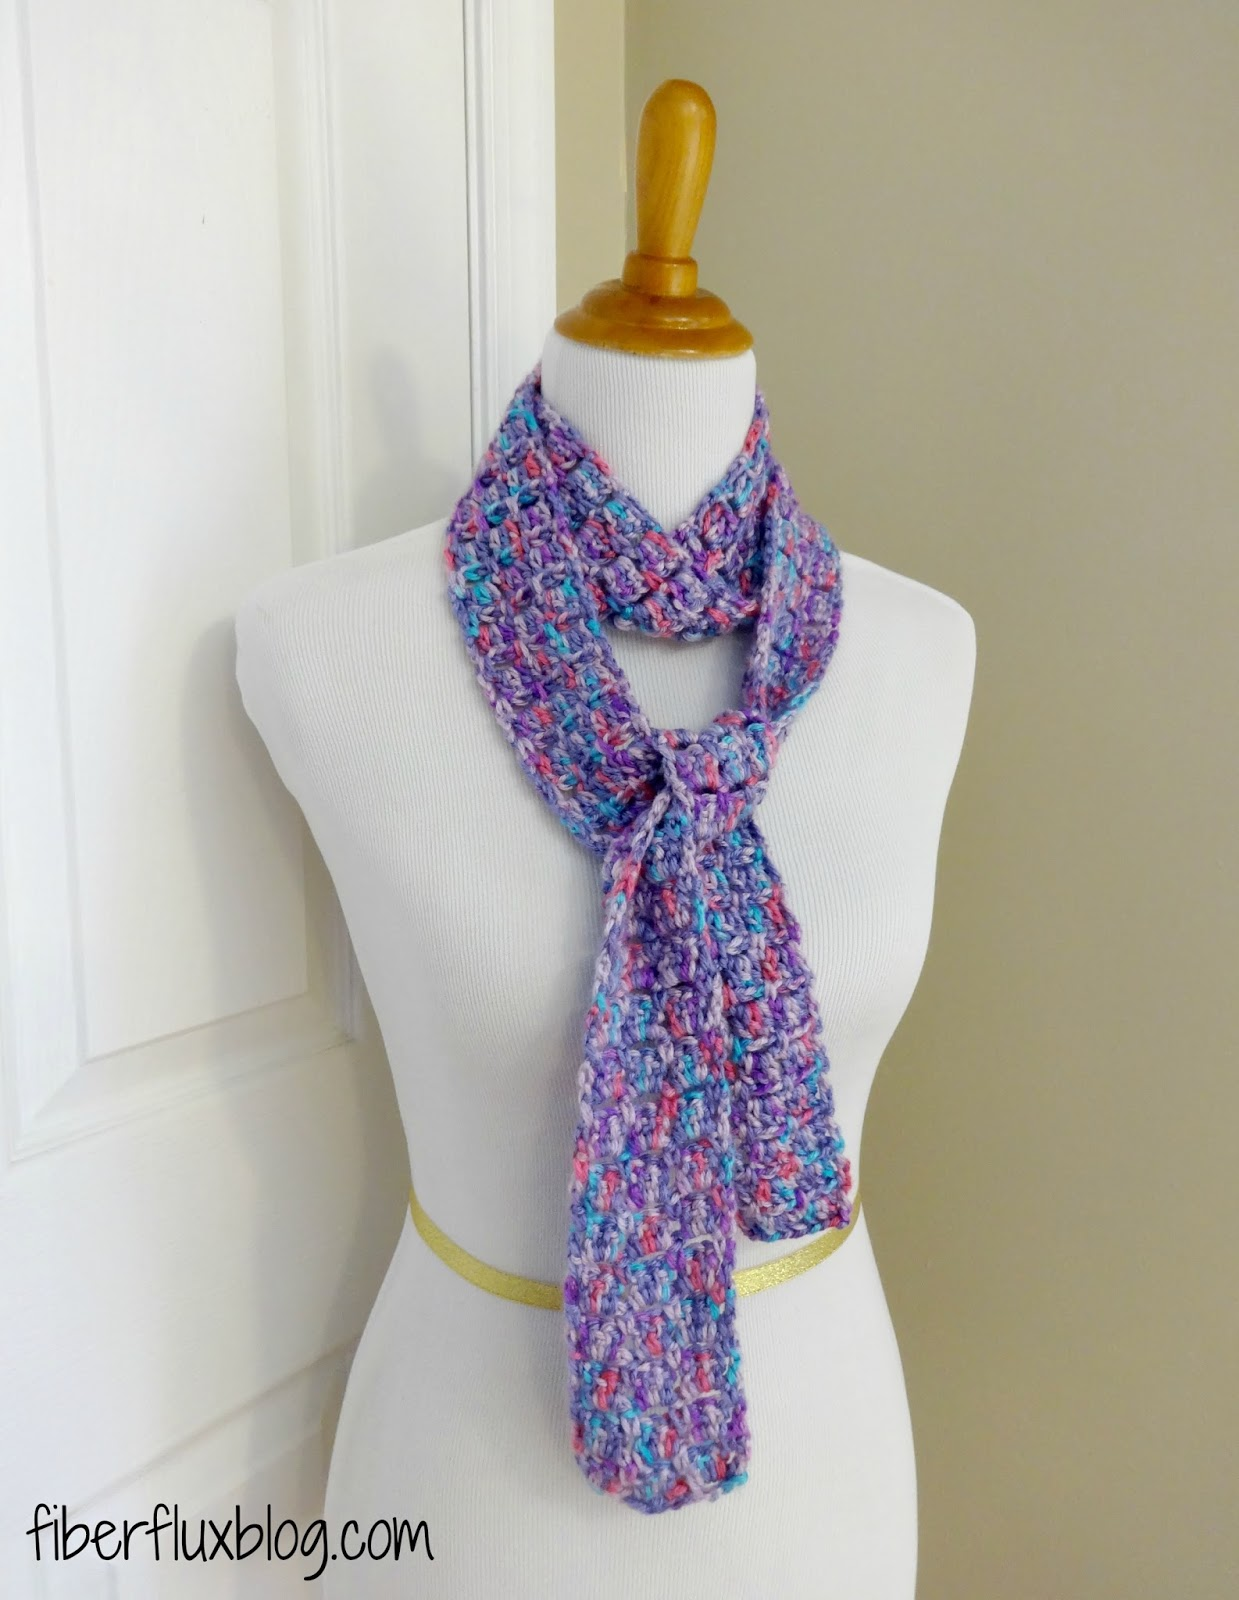 Free Crochet Patterns For Skinny Scarf : Fiber Flux: Free Crochet Pattern...Sugar Violet Skinny Scarf!